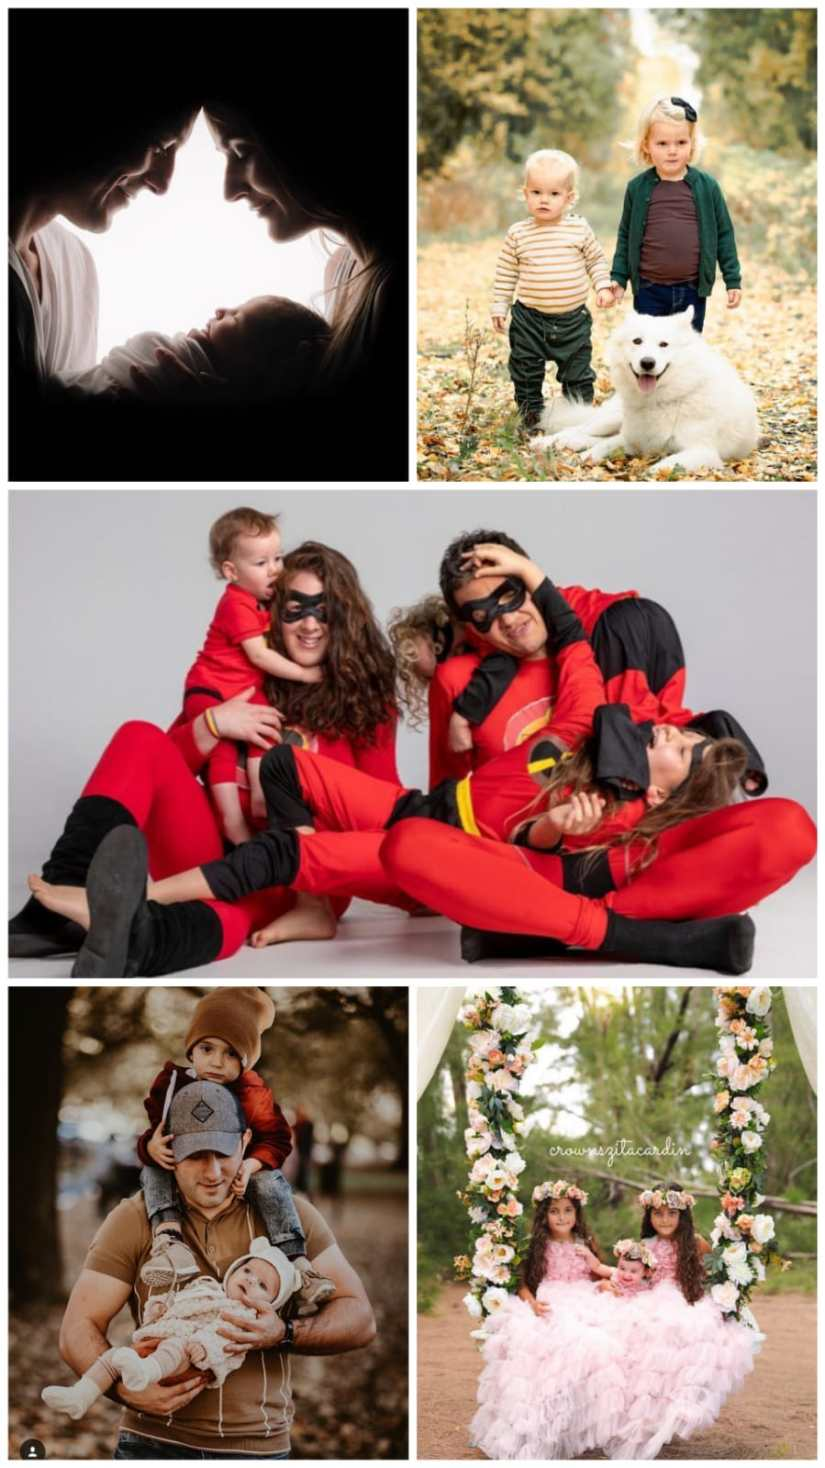 Unique Family Photoshoot Ideas